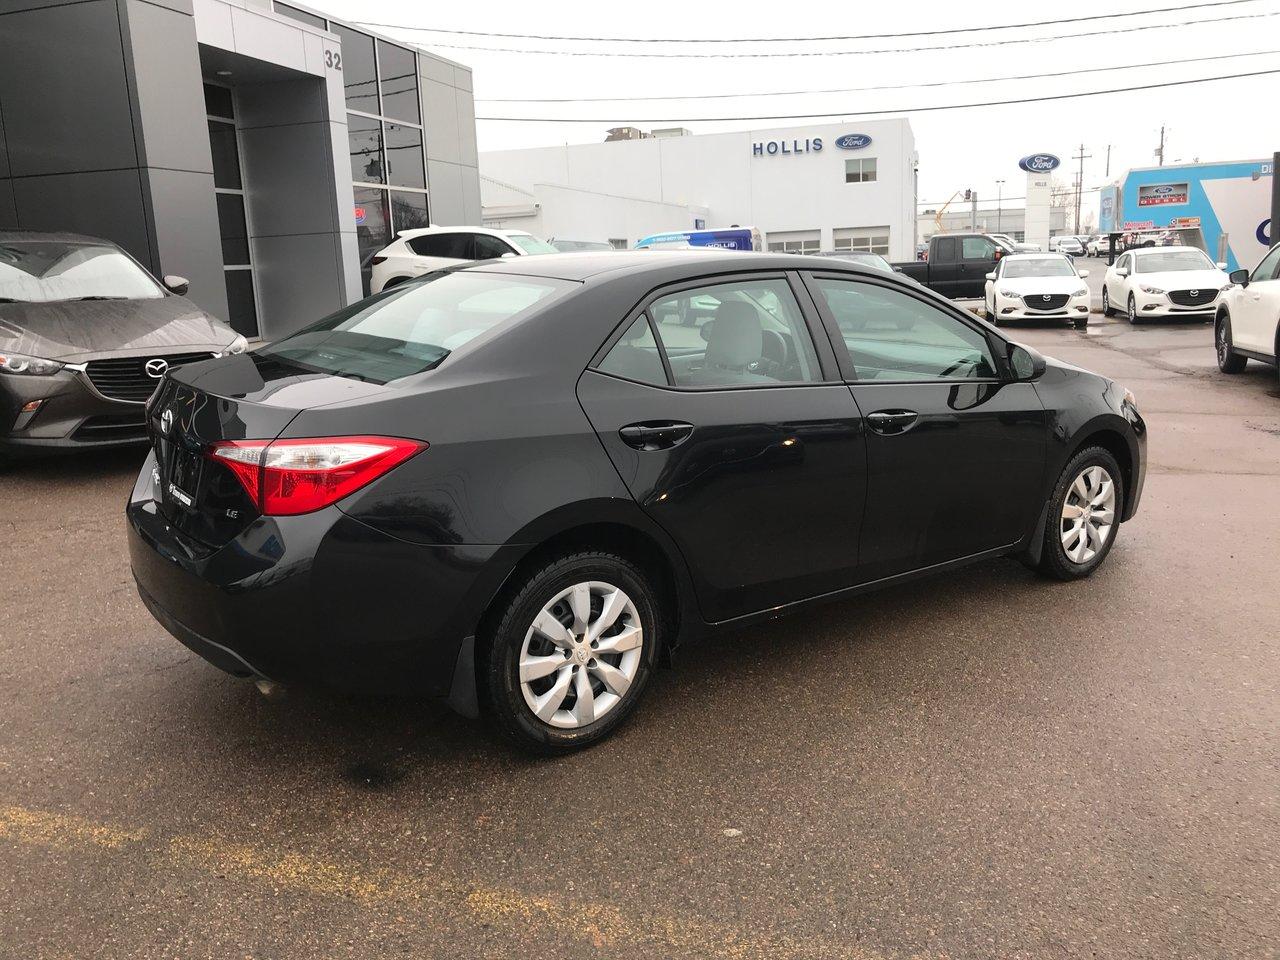 Used Toyota Corolla AUTO HEATED SEATS NEW TIRES NEW BRAKES - Auto corolla